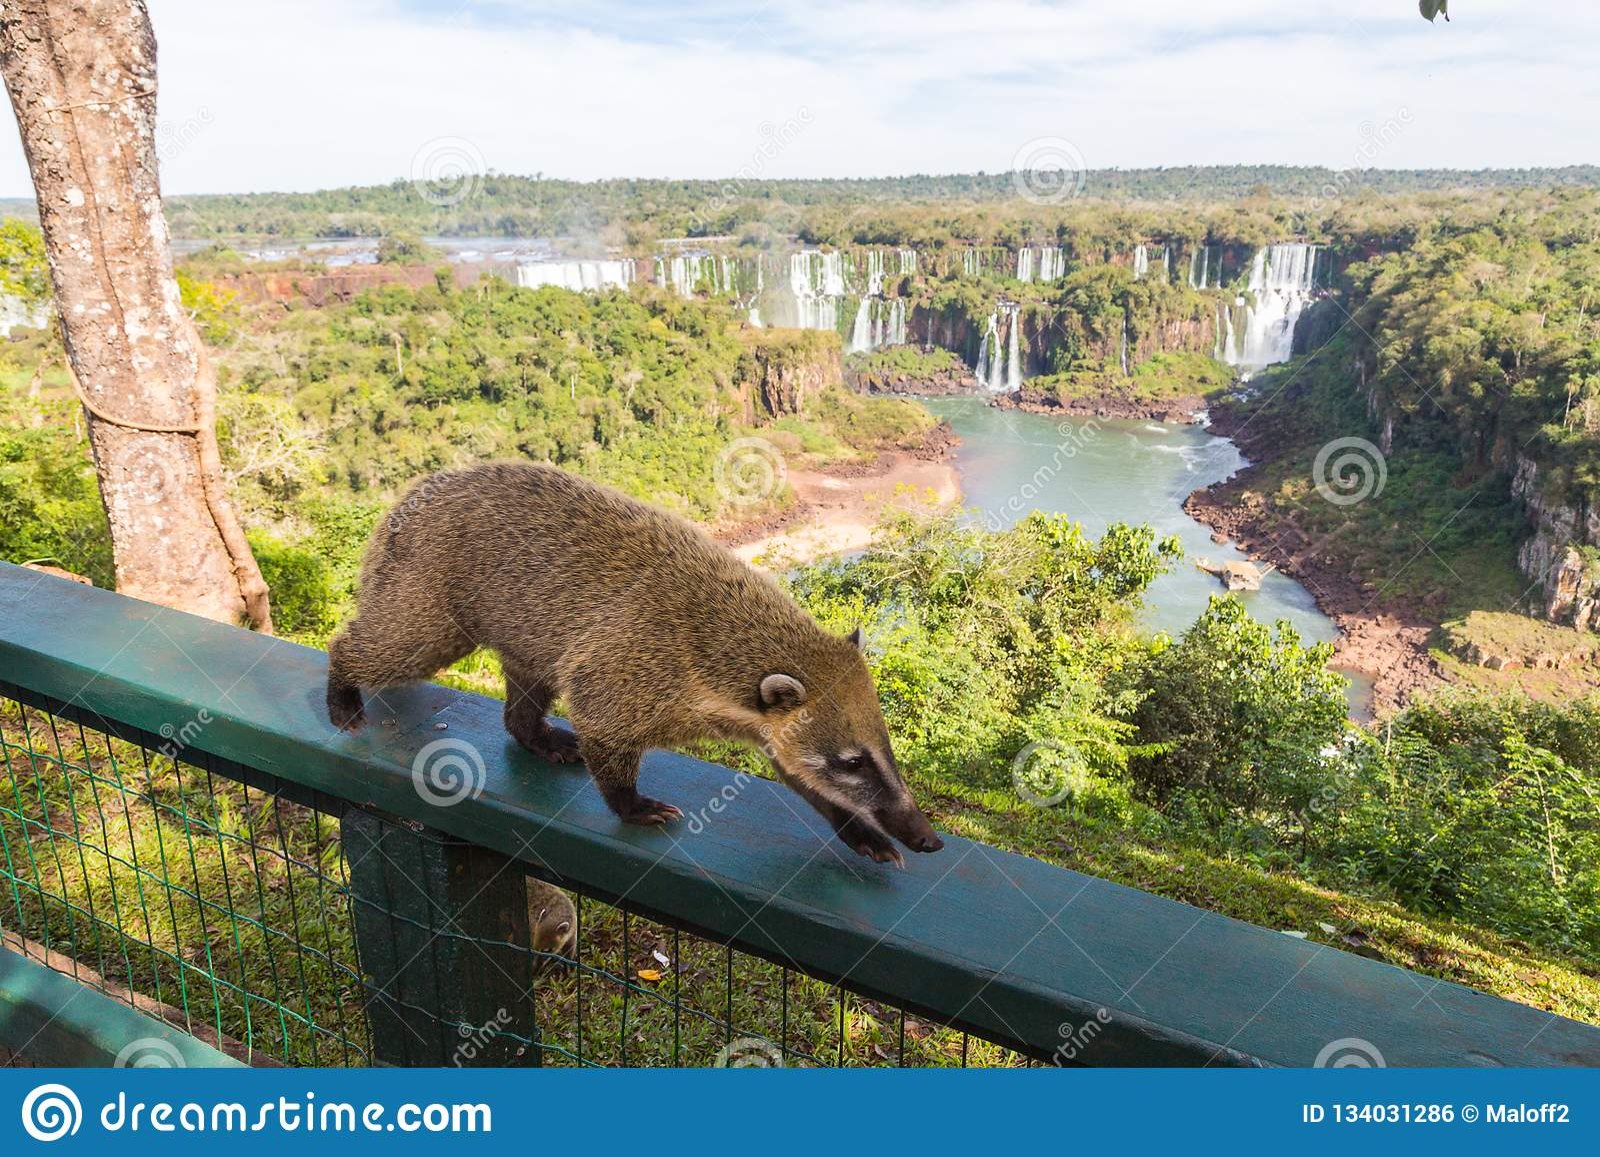 Wild coati nasua posing on Brazilian side of Iguazu falls national park. Argentinian side of Iguazu falls in the background.